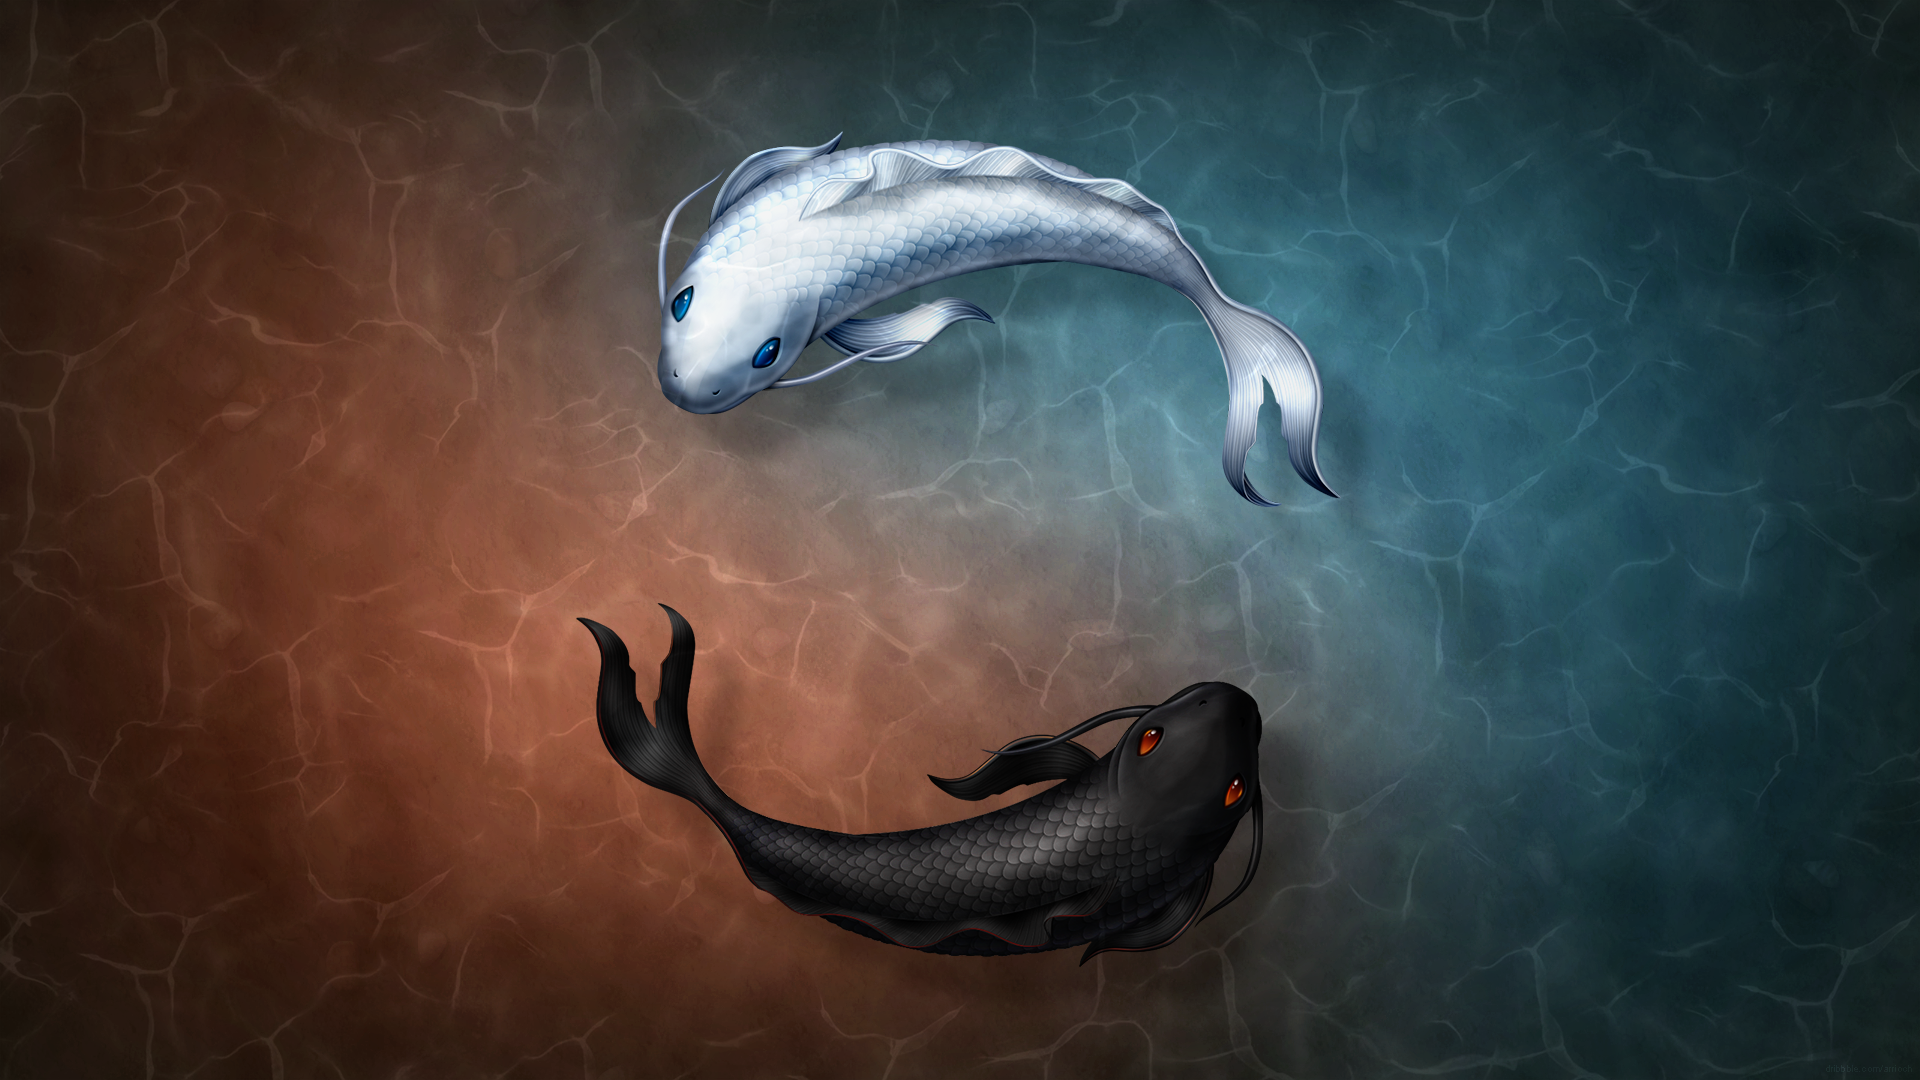 Image gallery koi art wallpaper for Koi fish wallpaper for walls